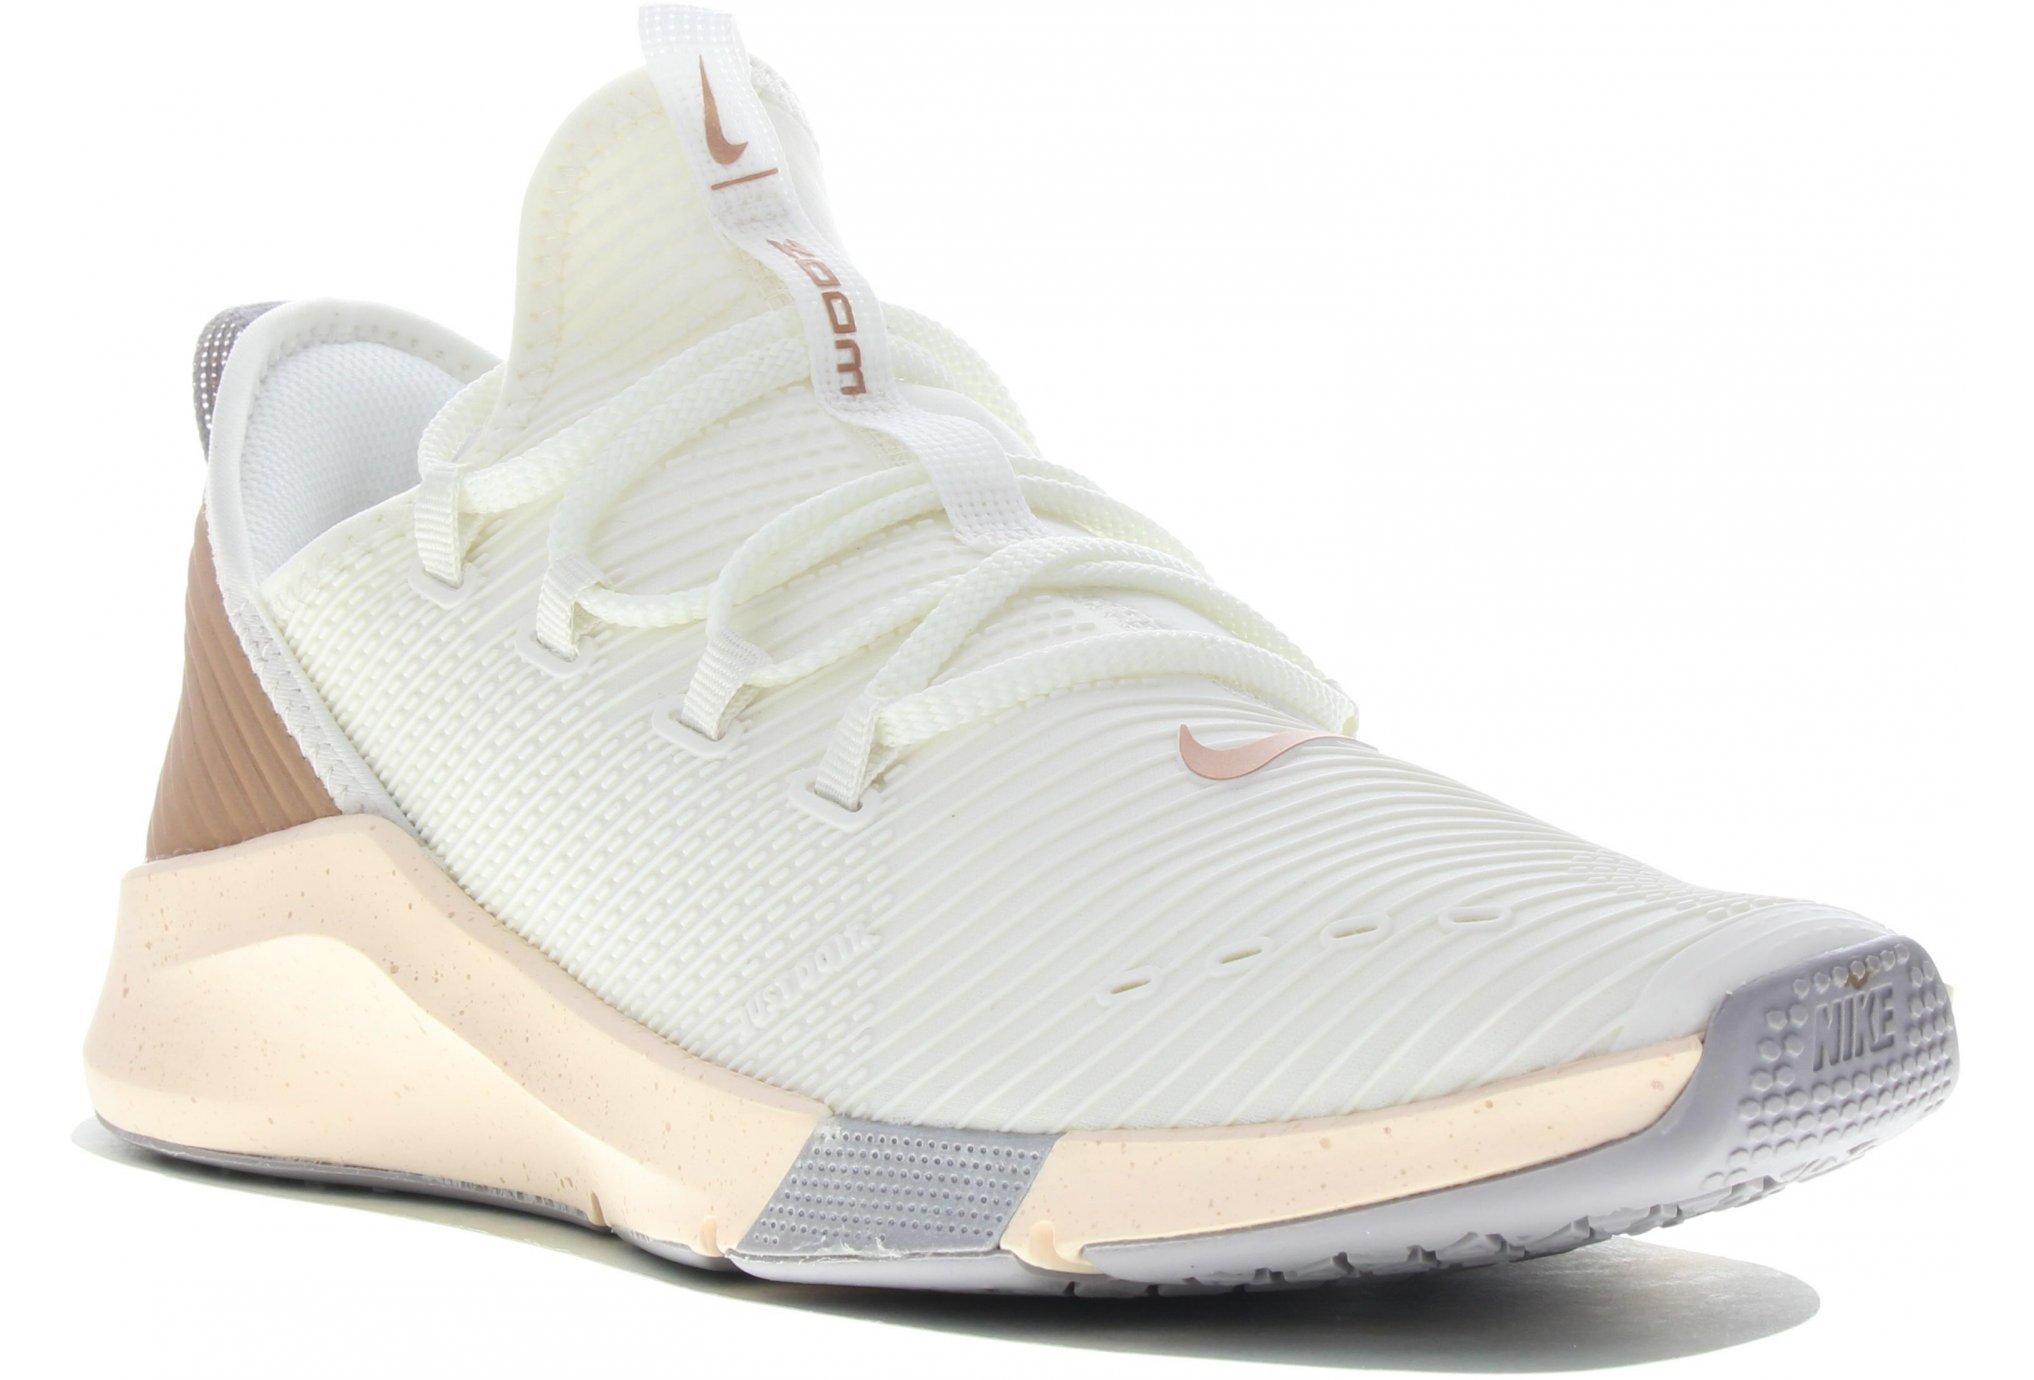 Nike Air Zoom Elevate Metallic W Diététique Chaussures femme